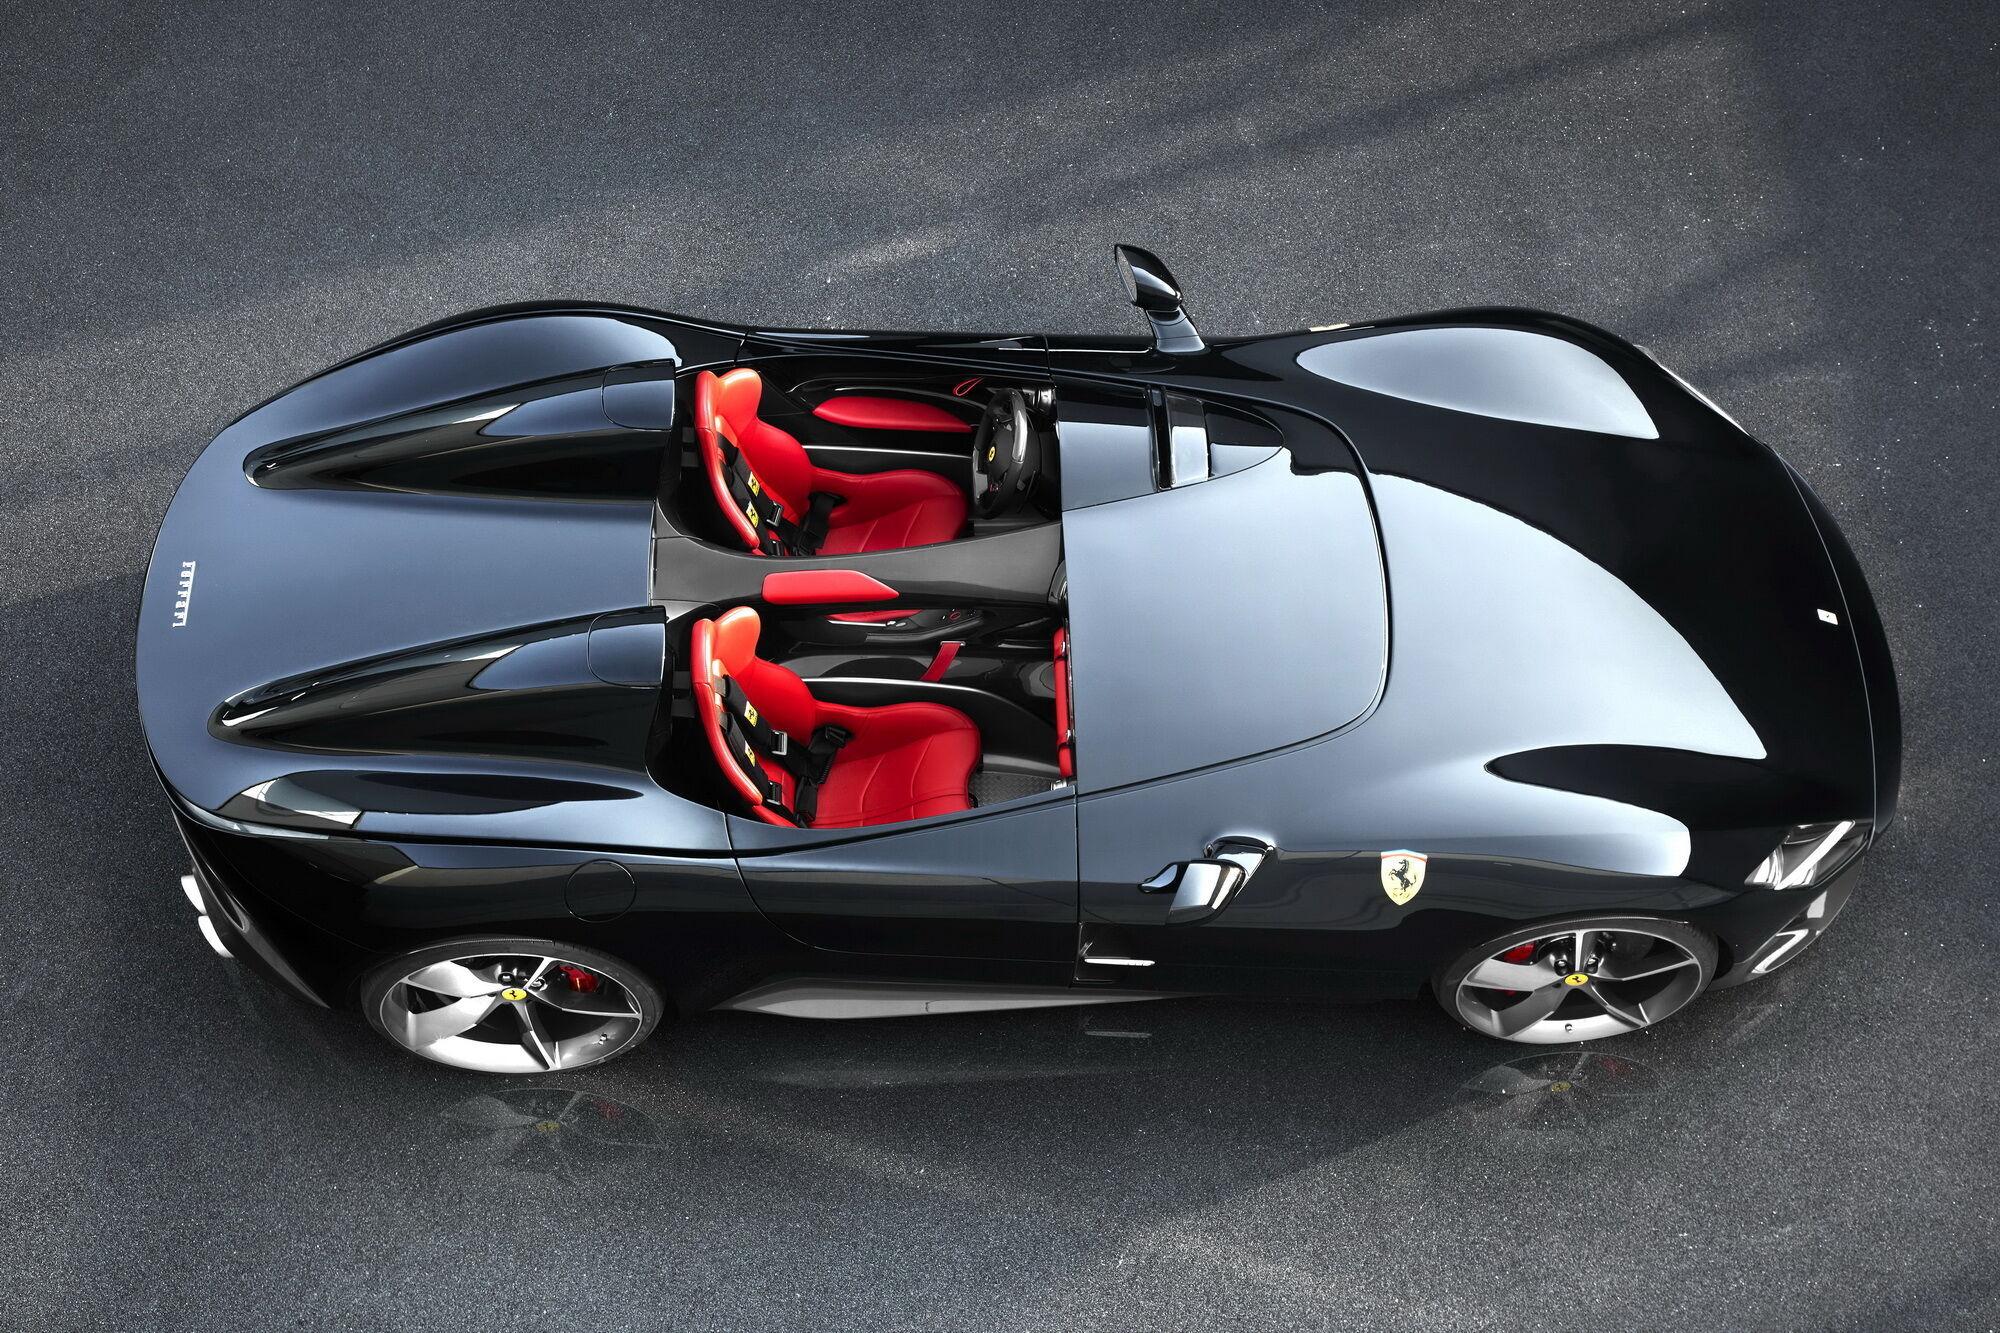 Ferrari Monza SP2 дебютував у 2018 році